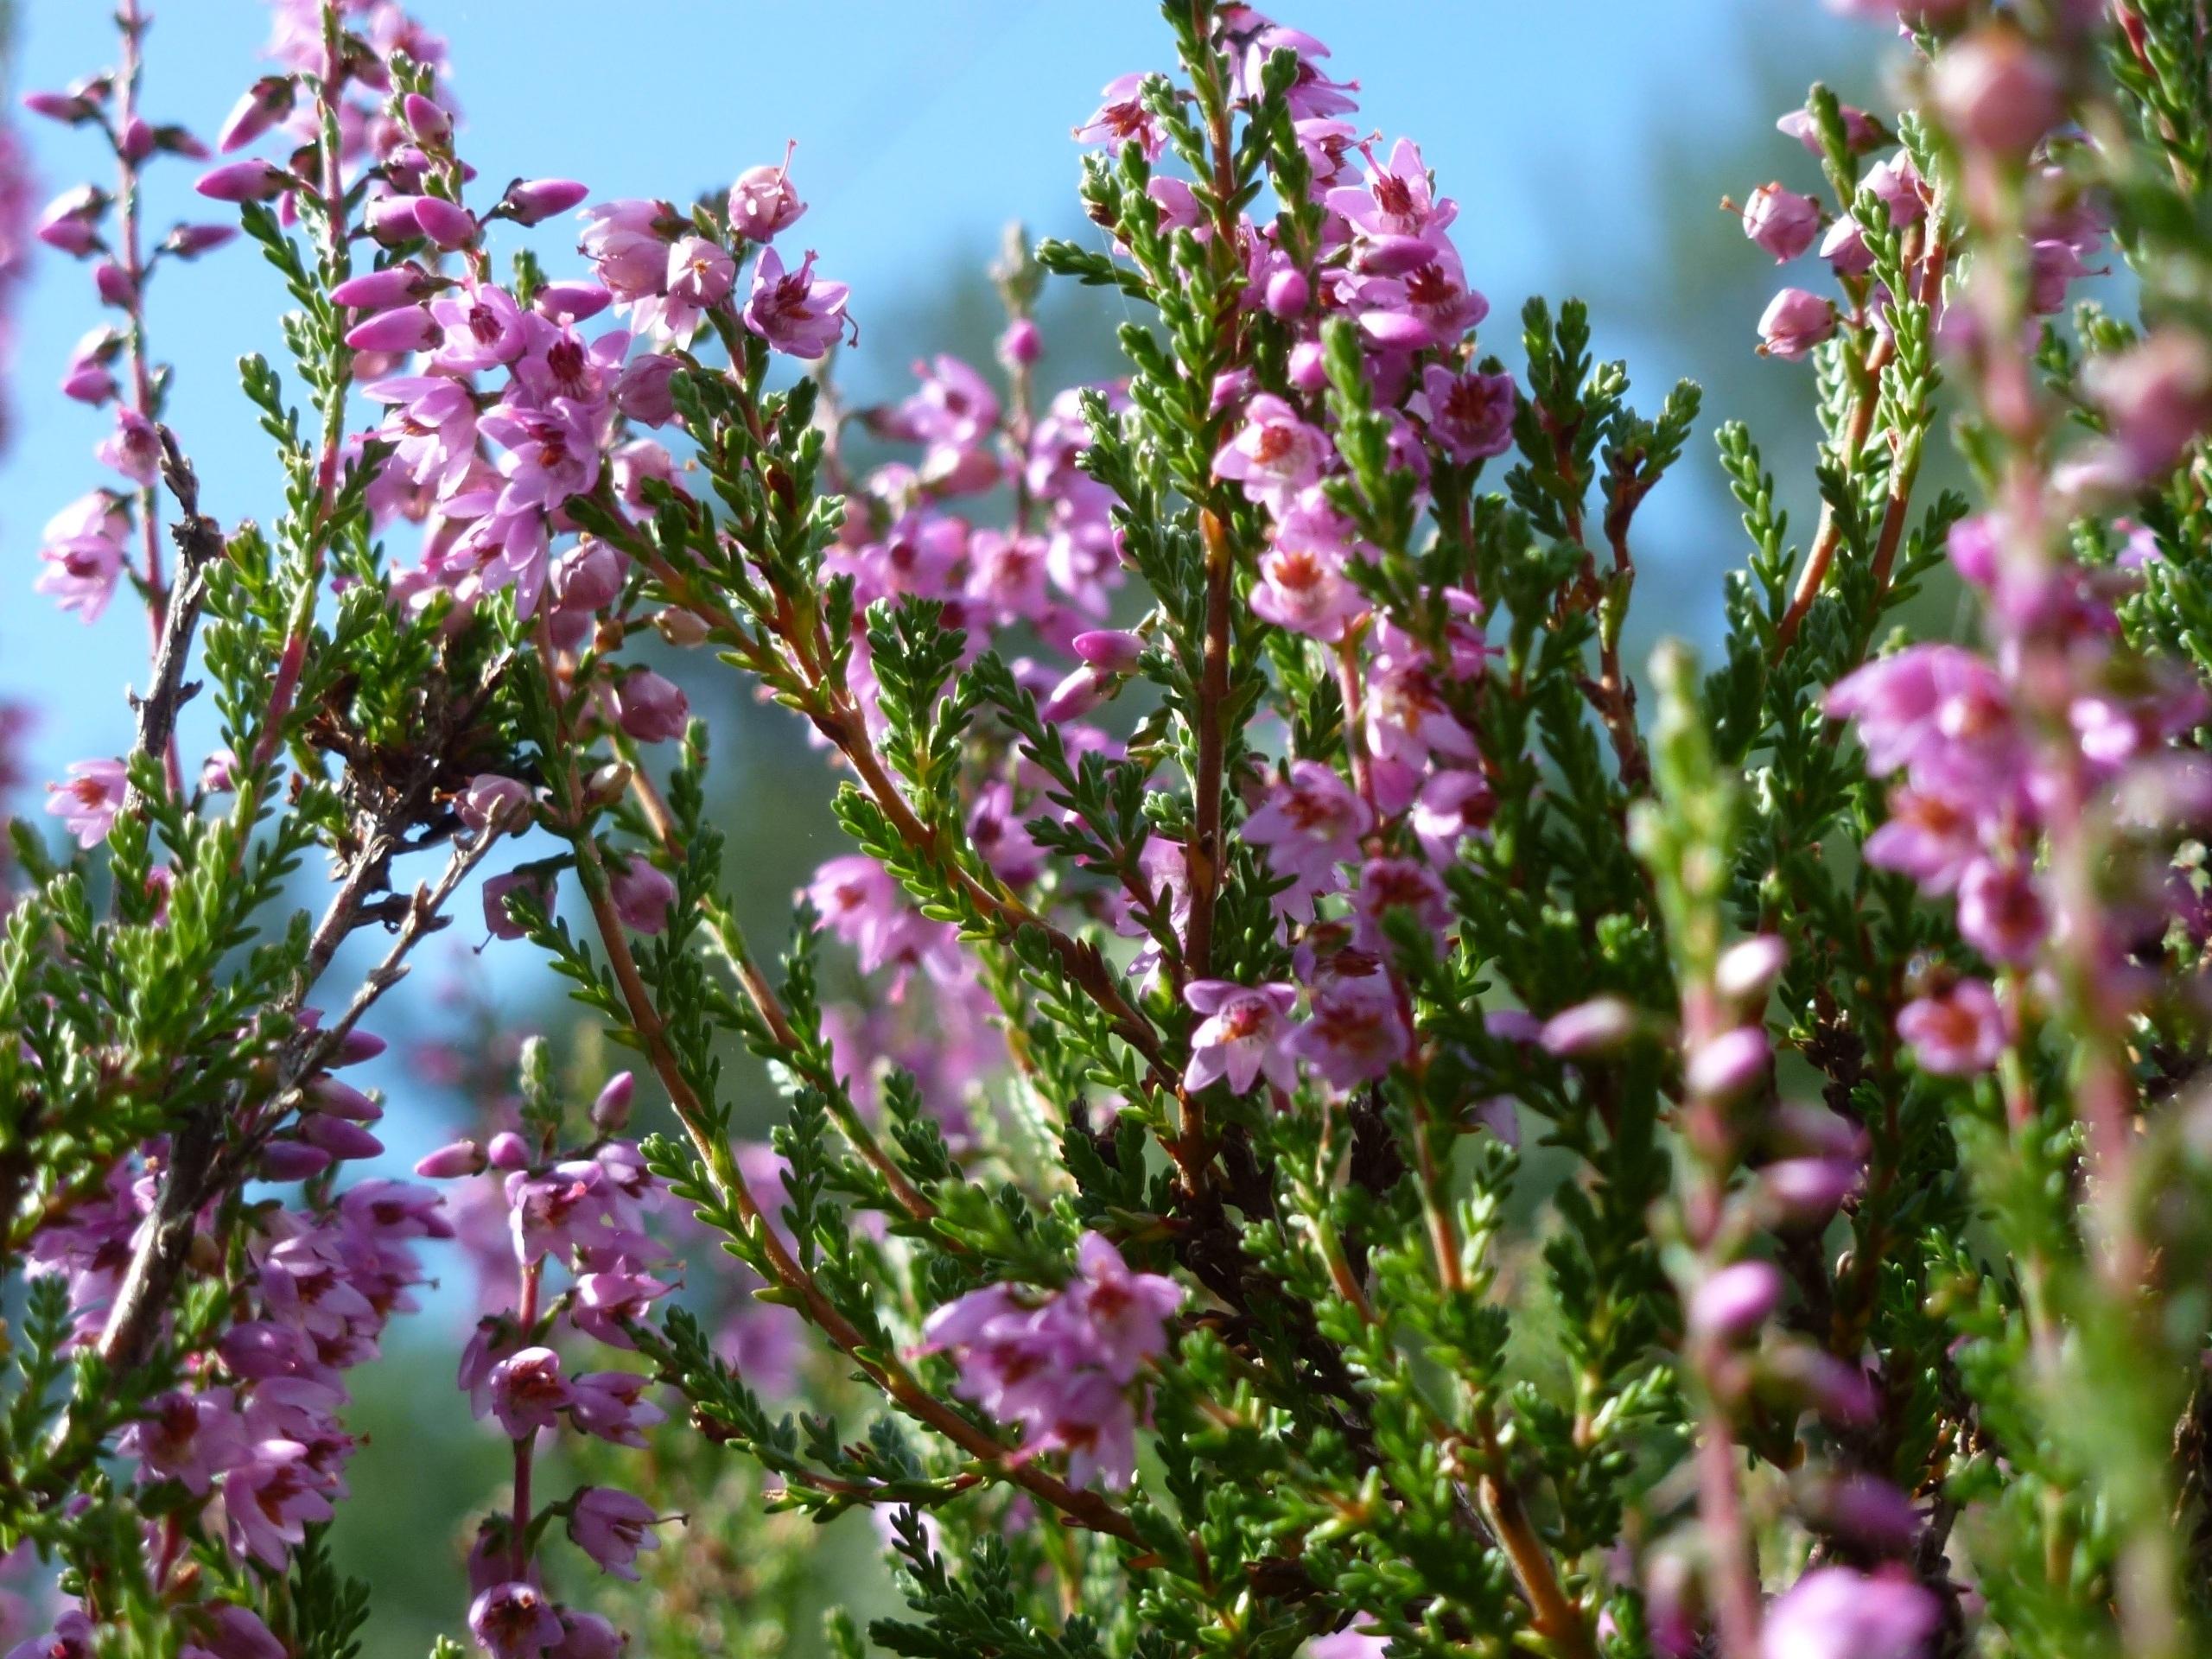 Free Images Nature Blossom Flower Purple Bloom Herb Botany